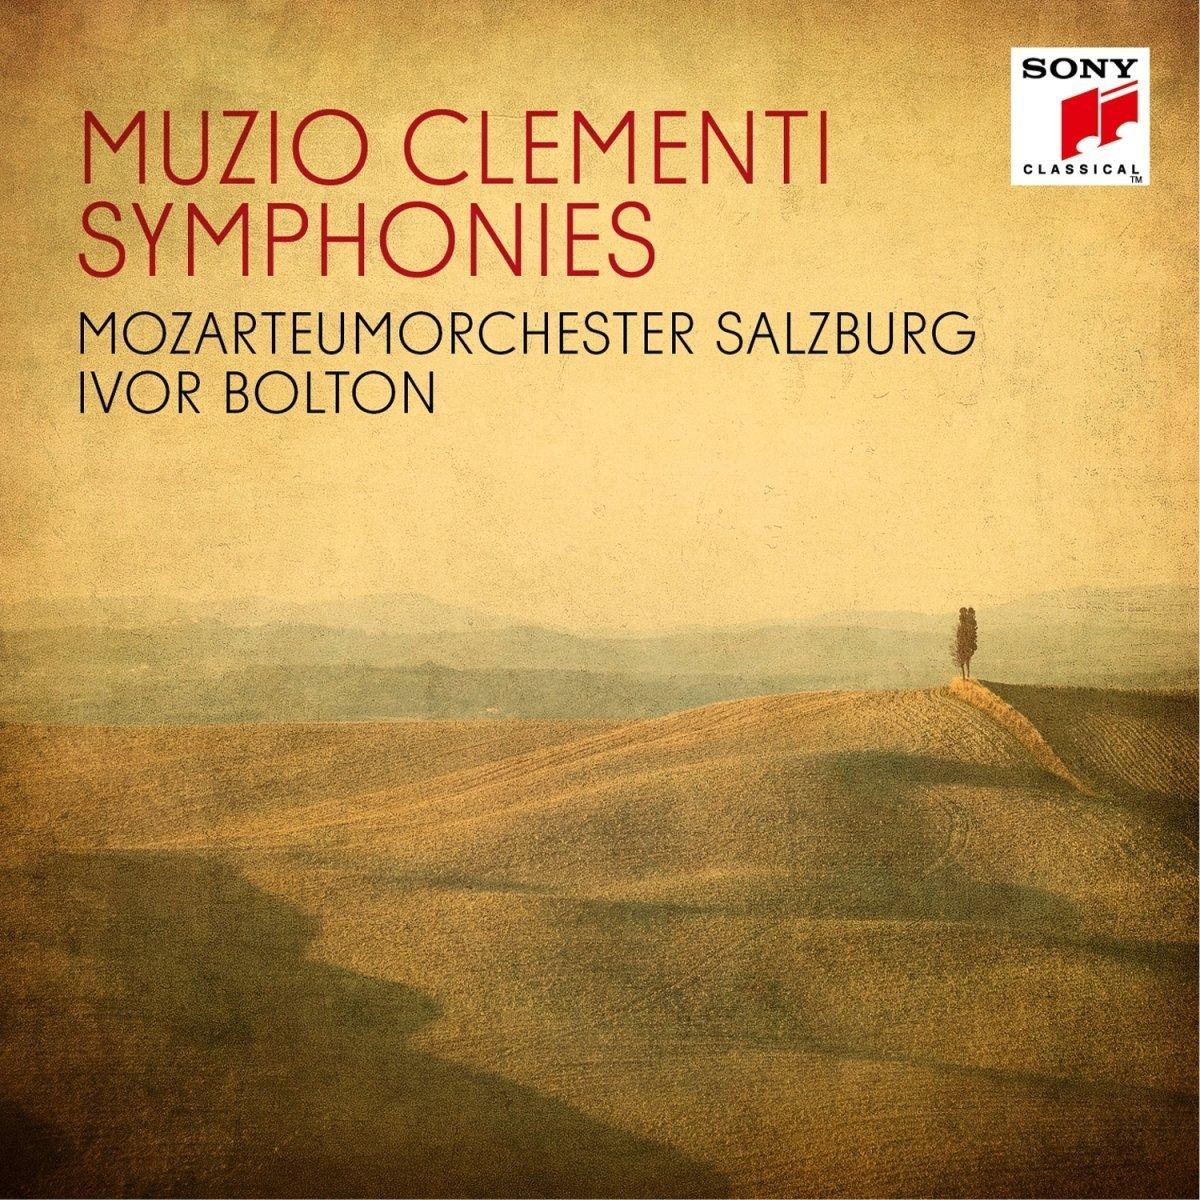 Muzio Clementi - Symphonies